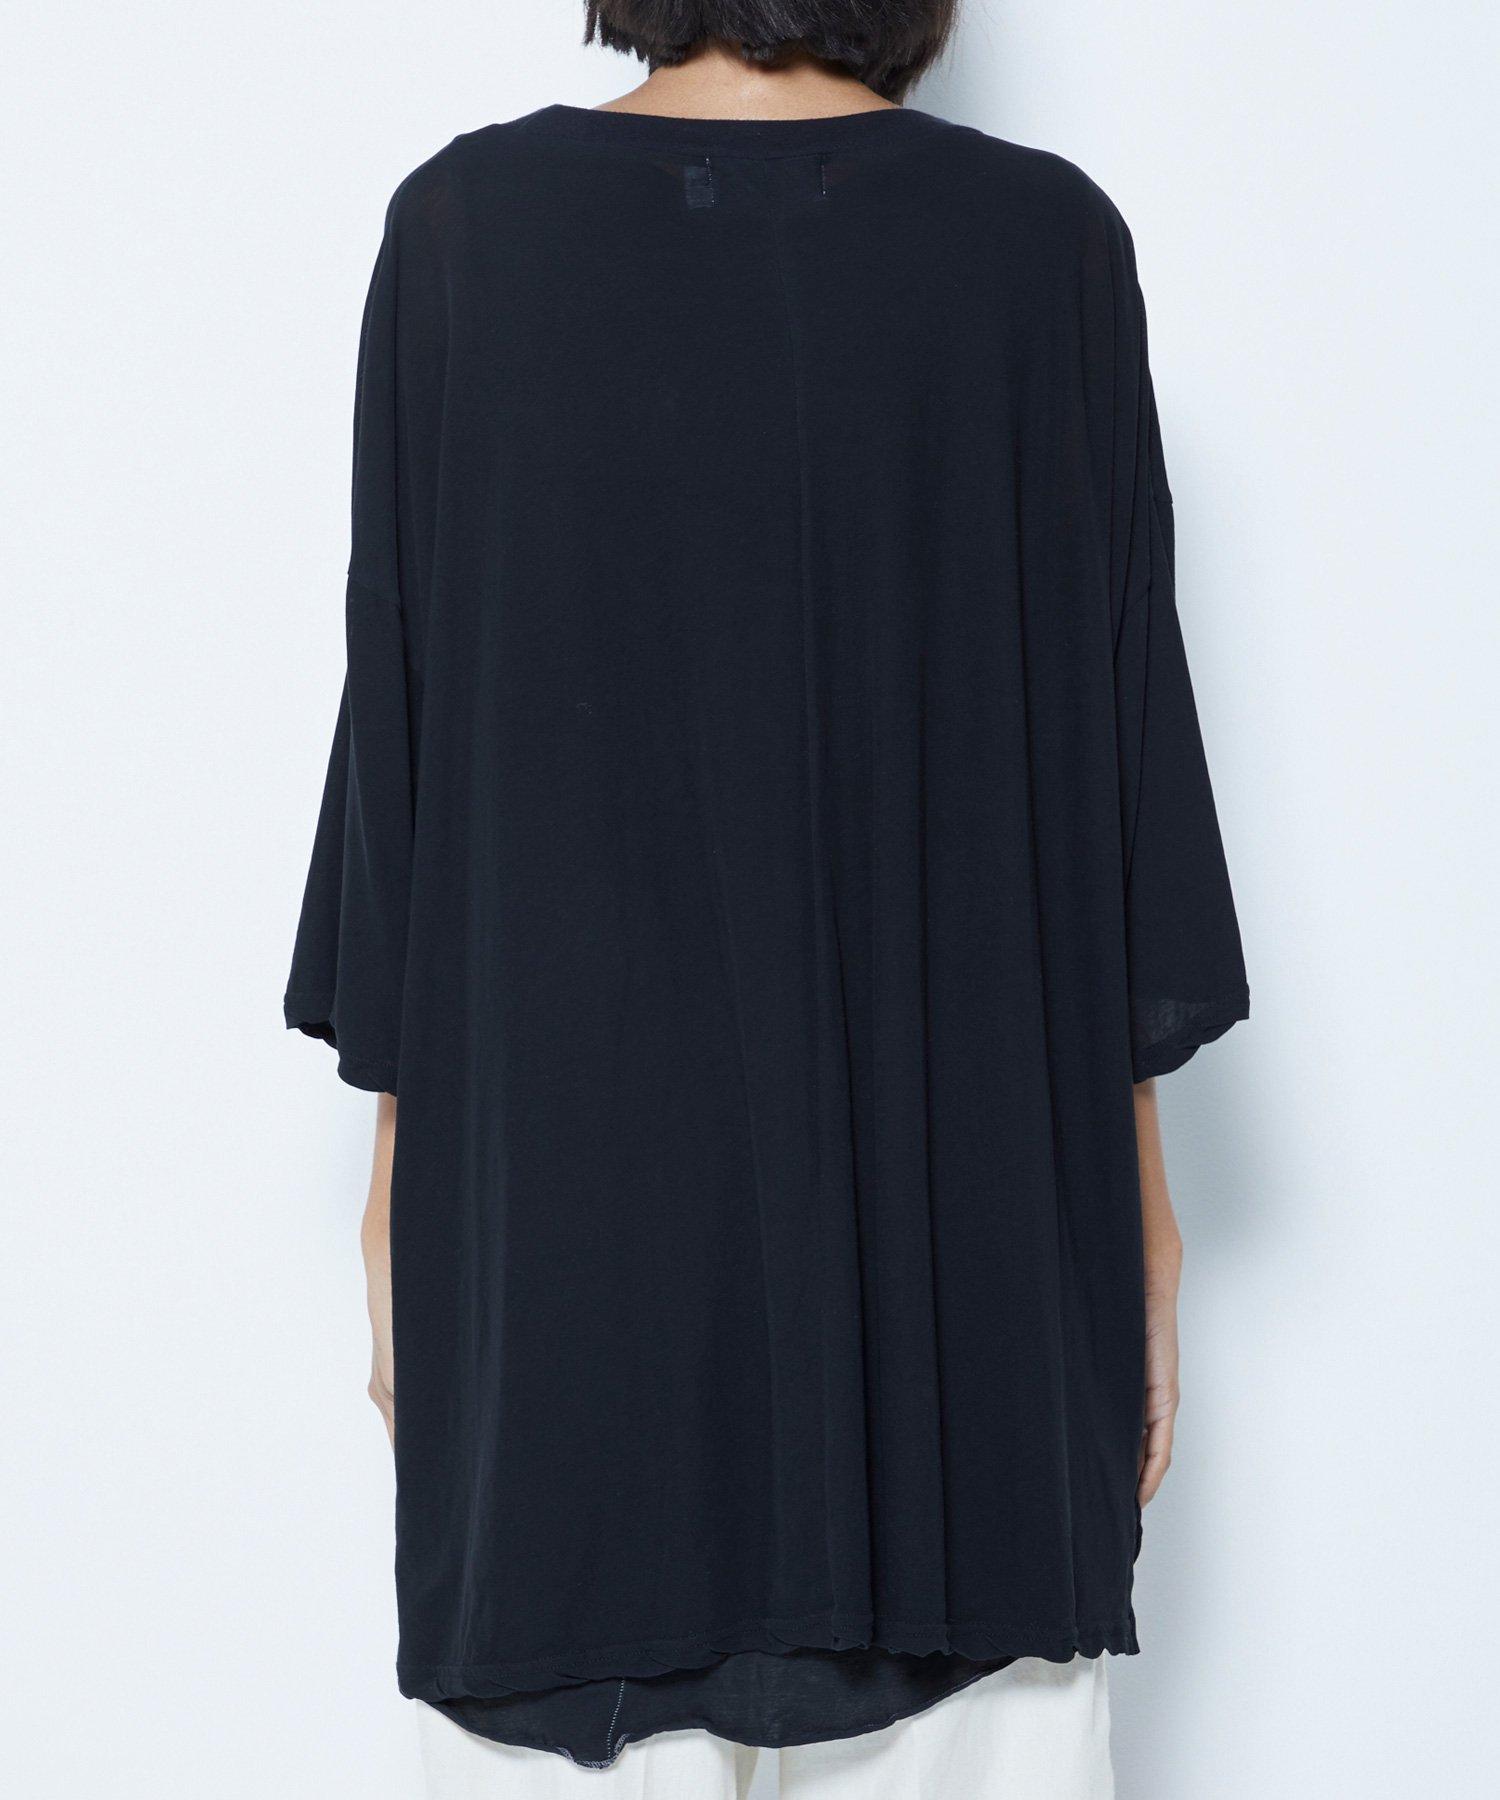 PKT TEE 【BLACK】